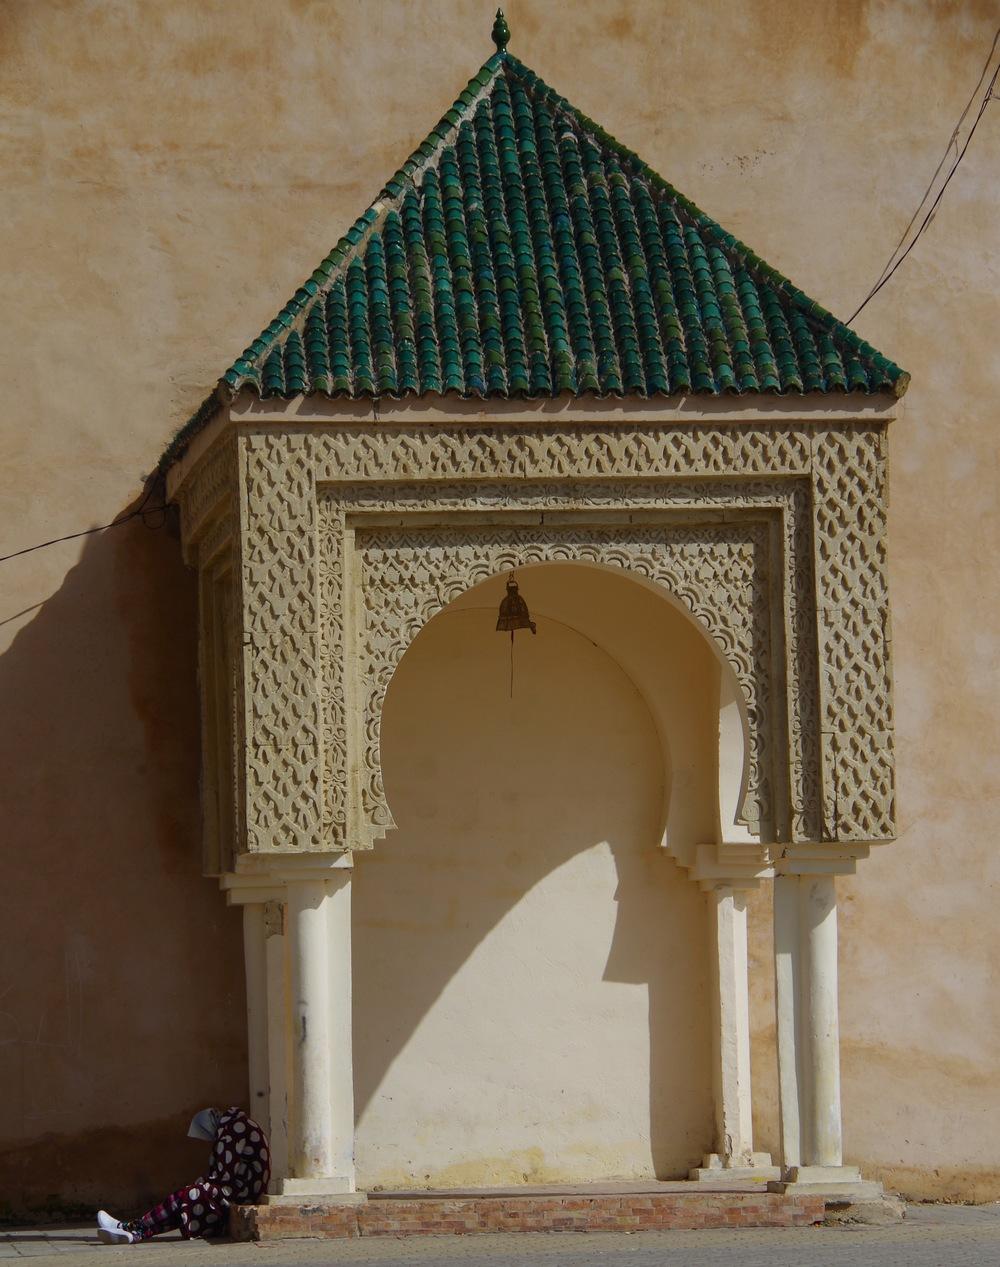 Meknes, Morocco  2015